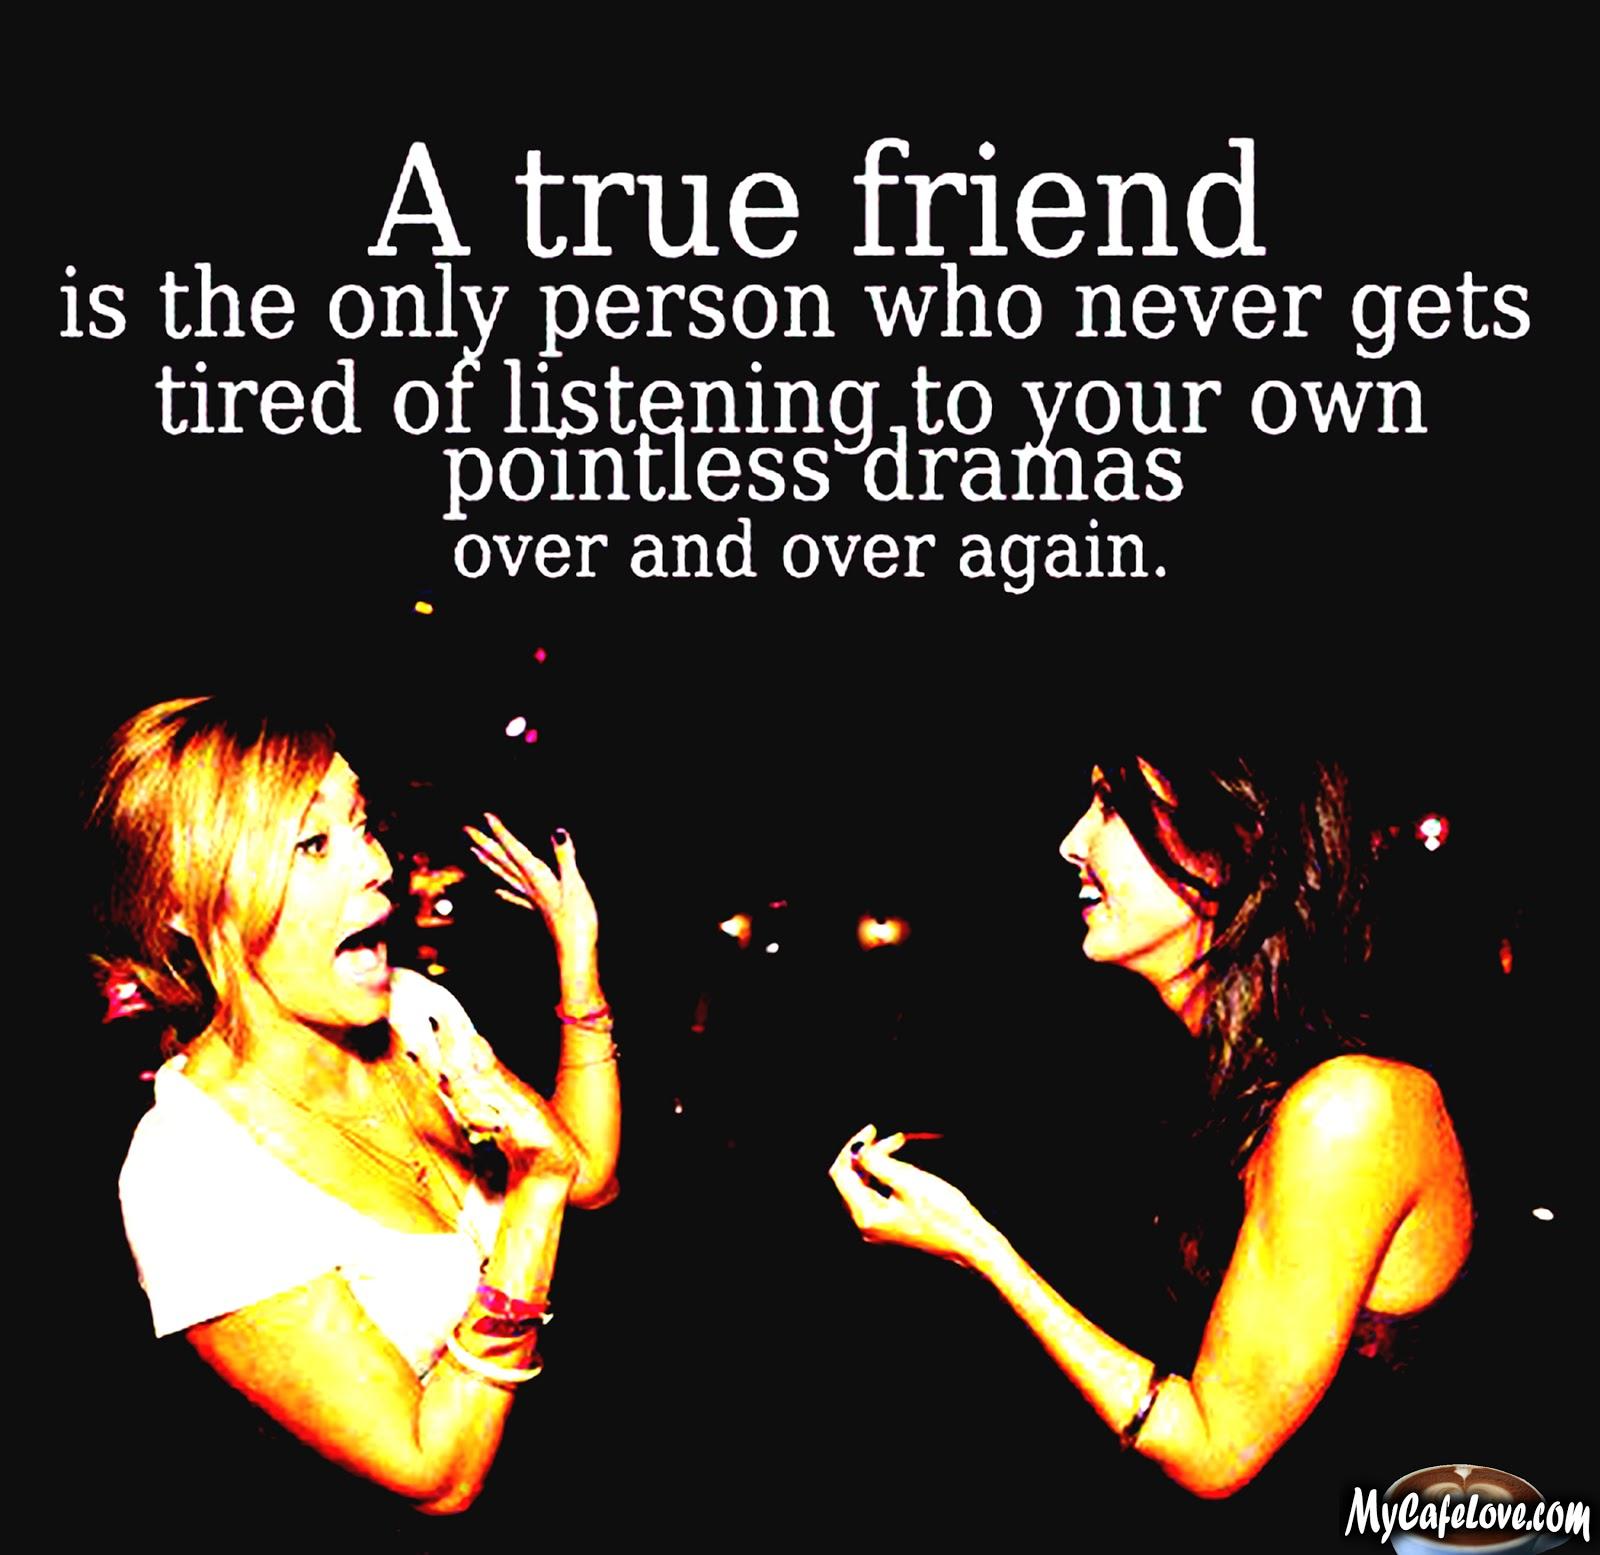 quotes true friendship - photo #15